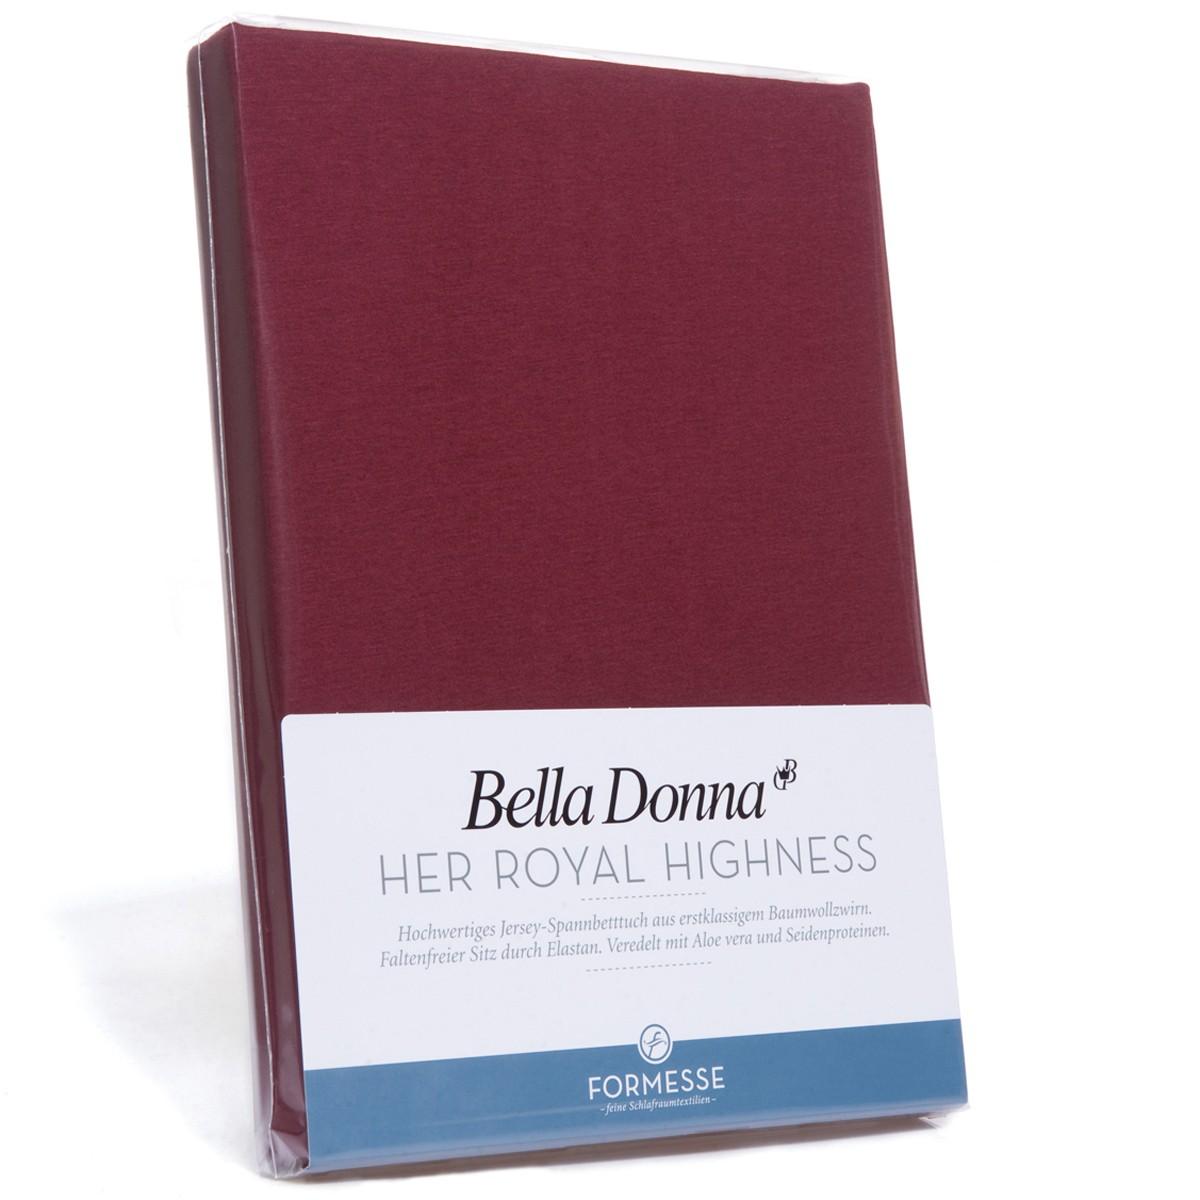 boxspring spannbettlaken bella donna jersey alto bis 40 cm bettlaken jersey spannbettlaken. Black Bedroom Furniture Sets. Home Design Ideas